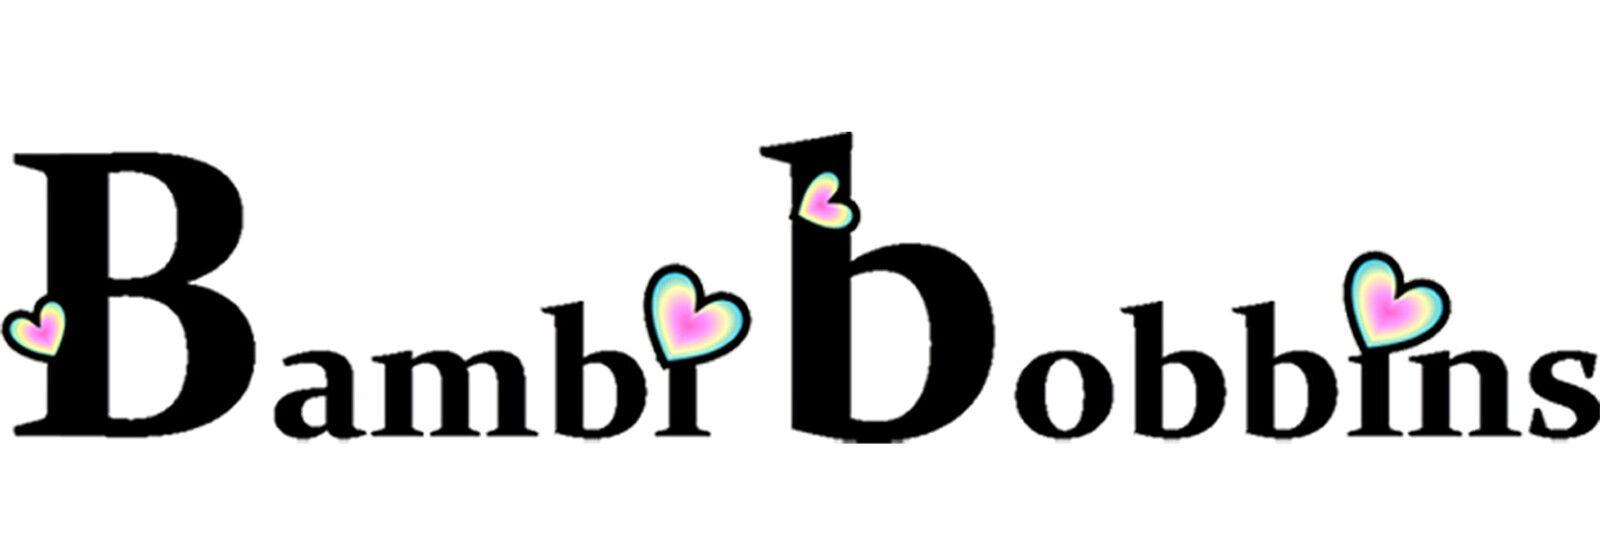 Bambi Bobbins